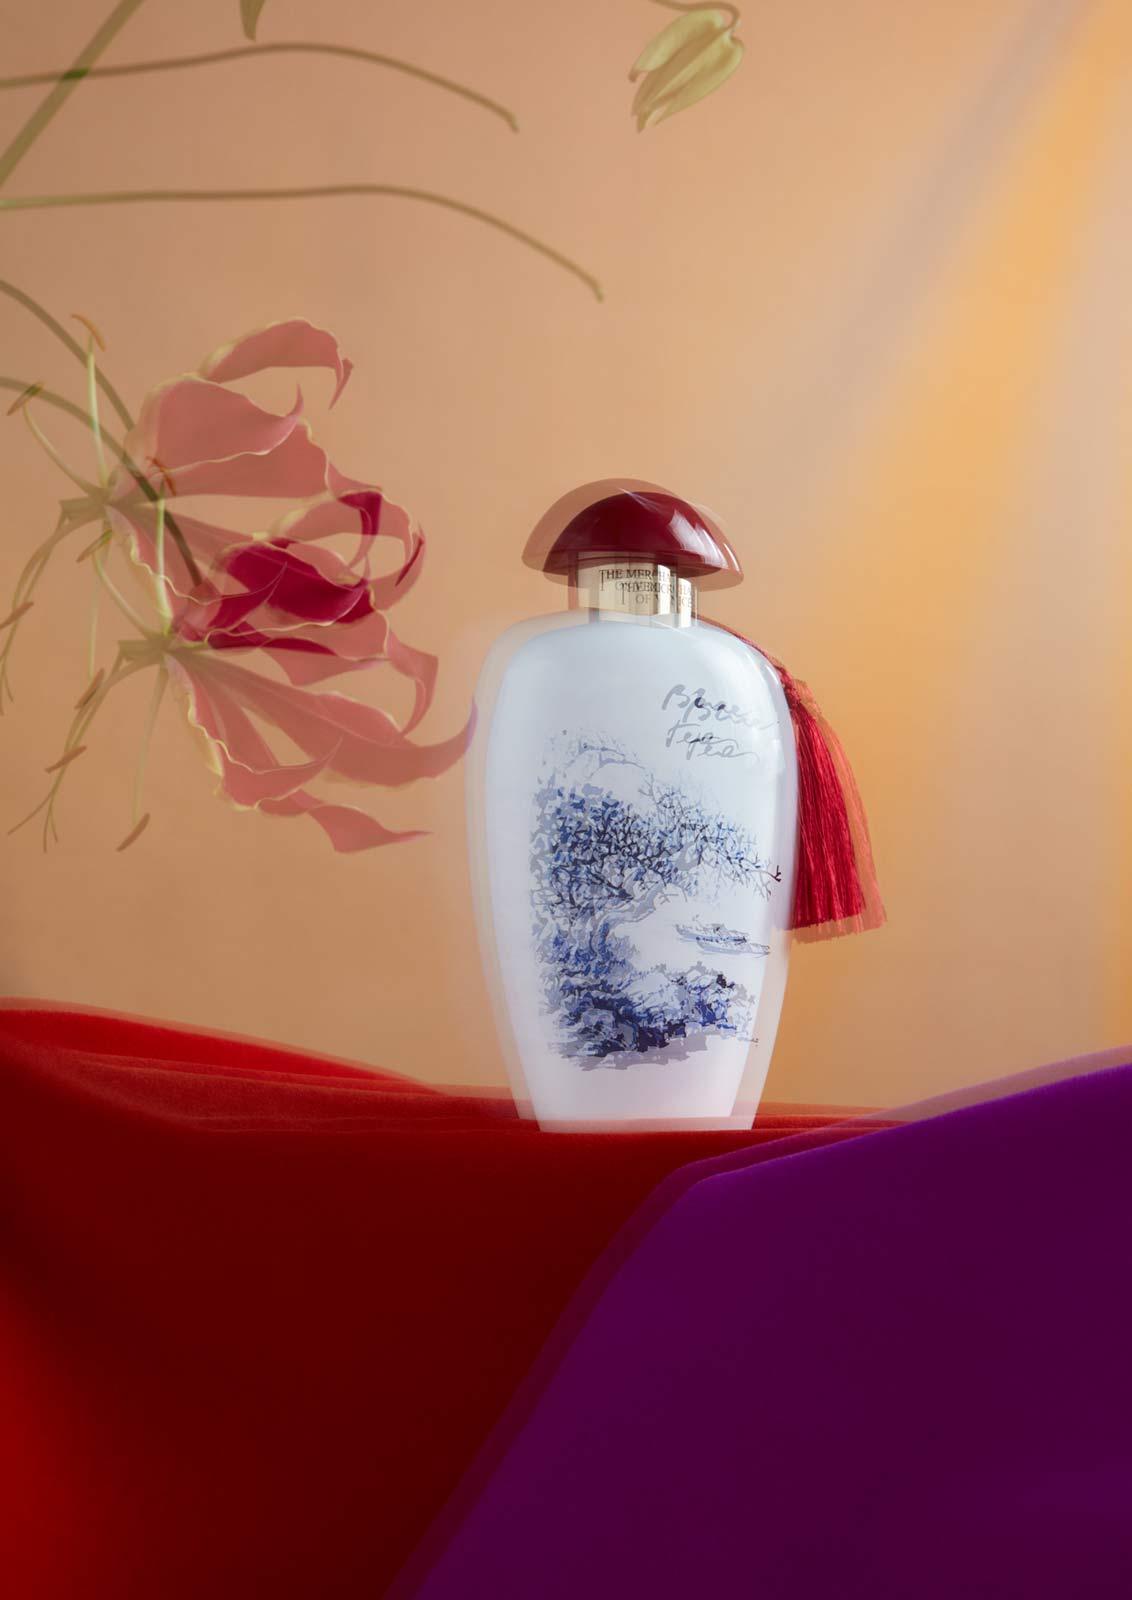 Harrods-Fragrance-Marchant-Of-Venice-Johanne-Mills.jpg